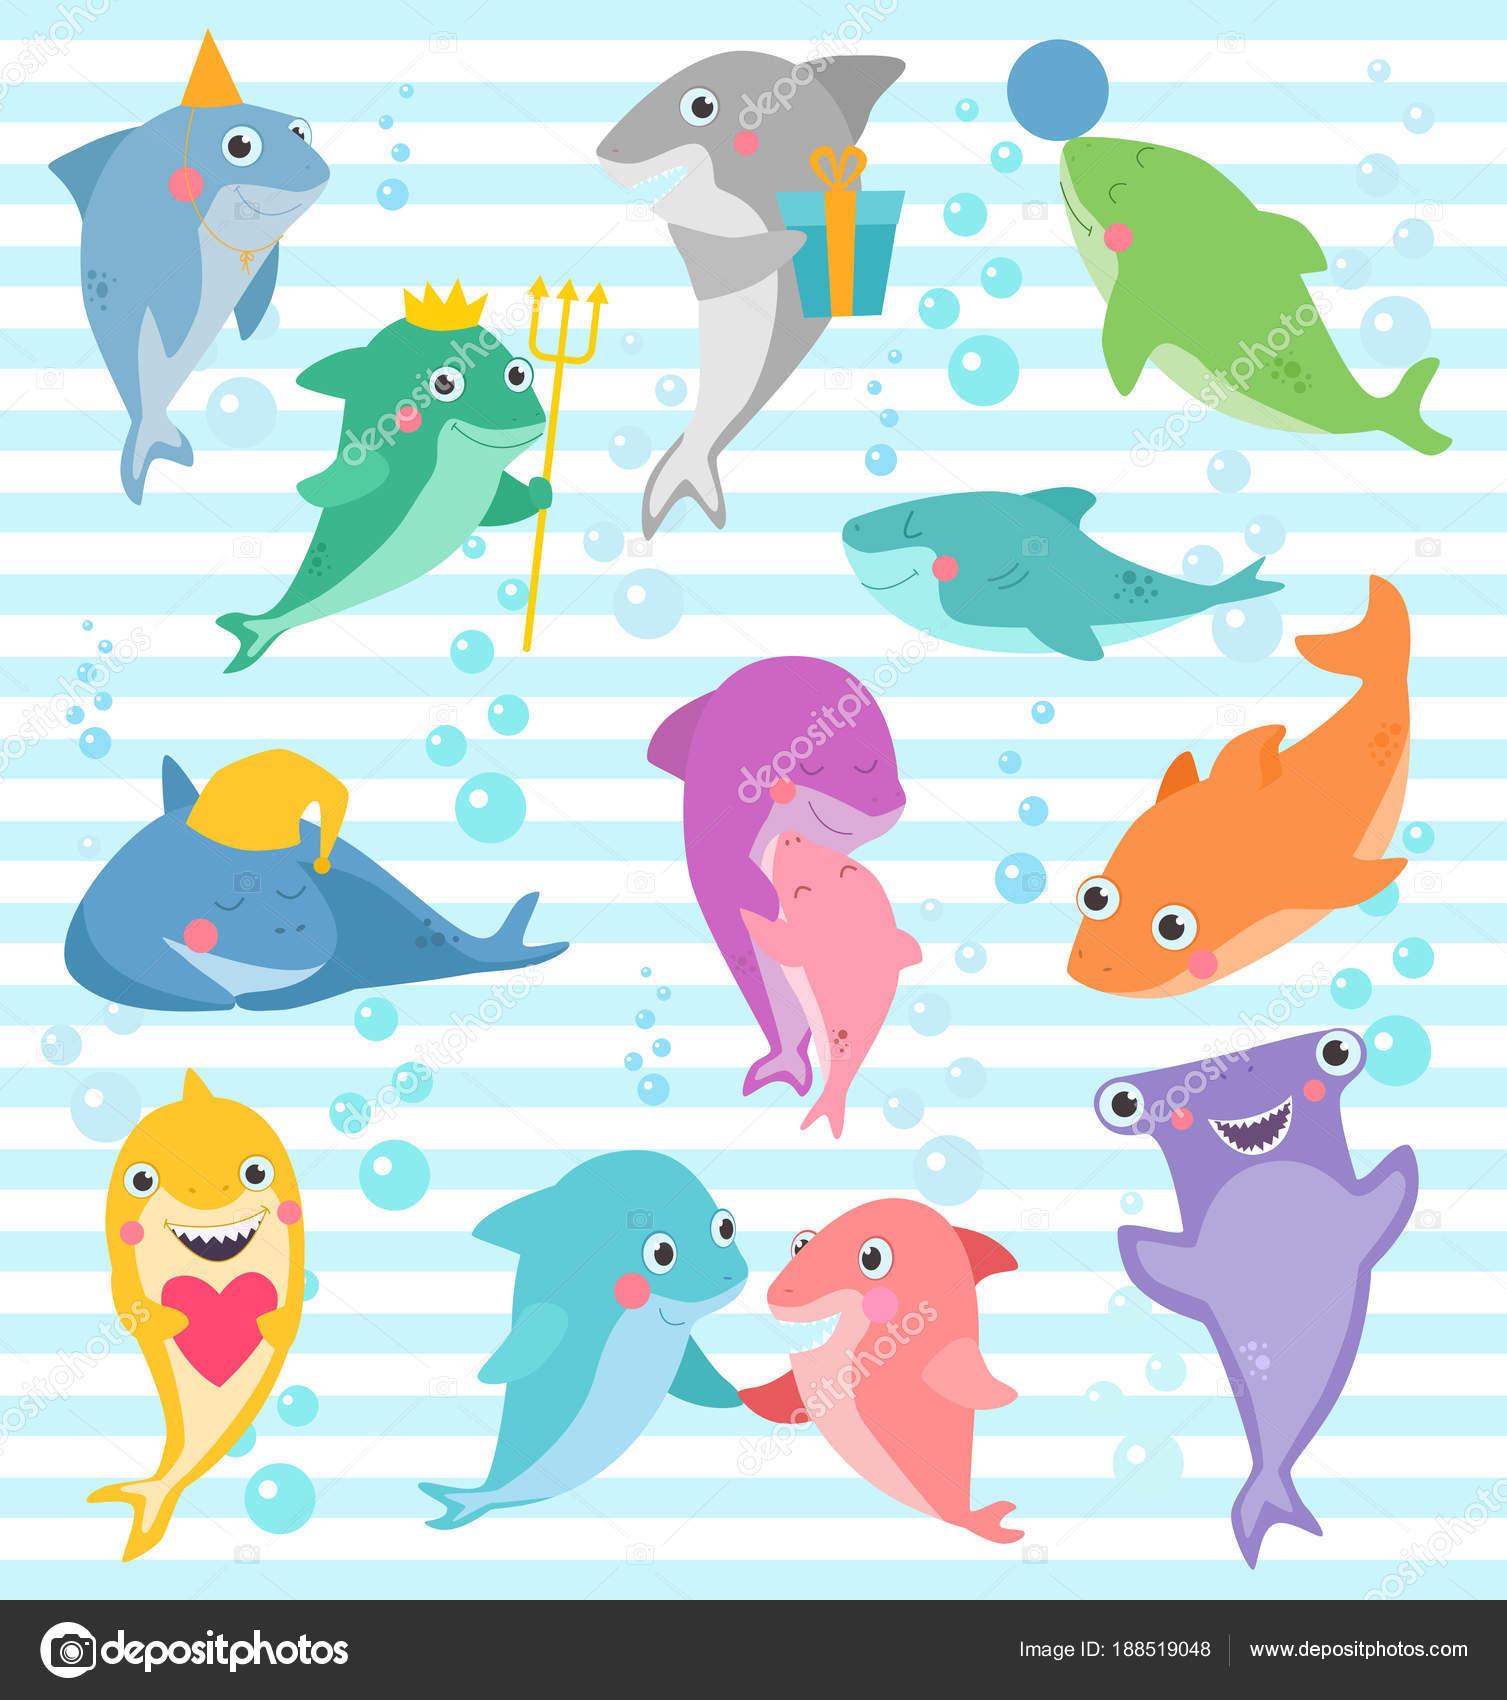 Fondo Cumpleanos Animales Marinos Tiburon Vector Dibujos Animados